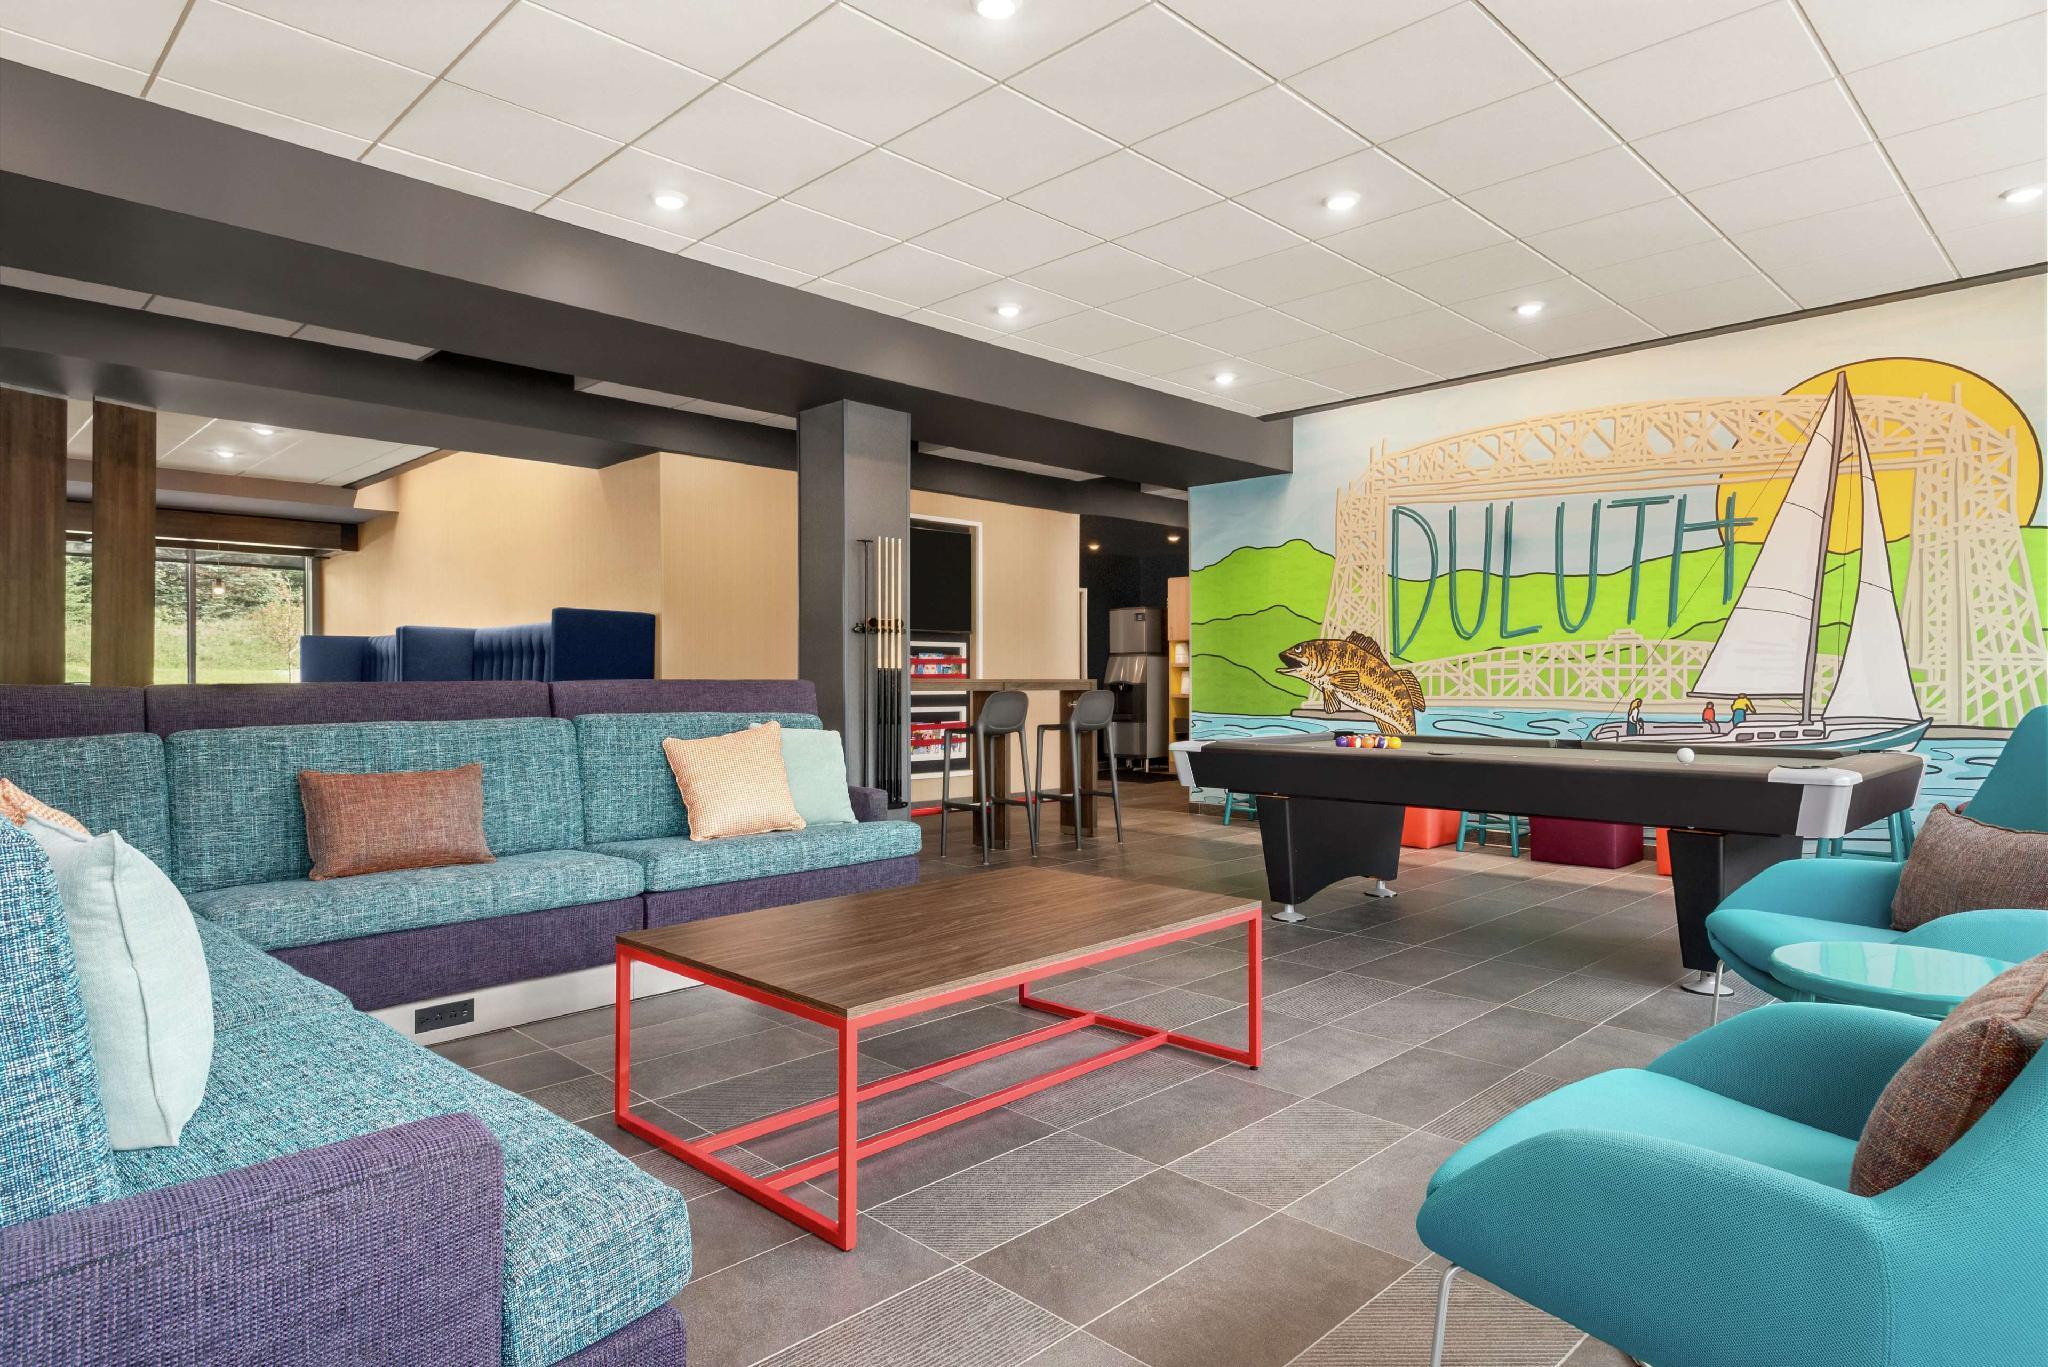 Tru By Hilton Duluth Mall Area